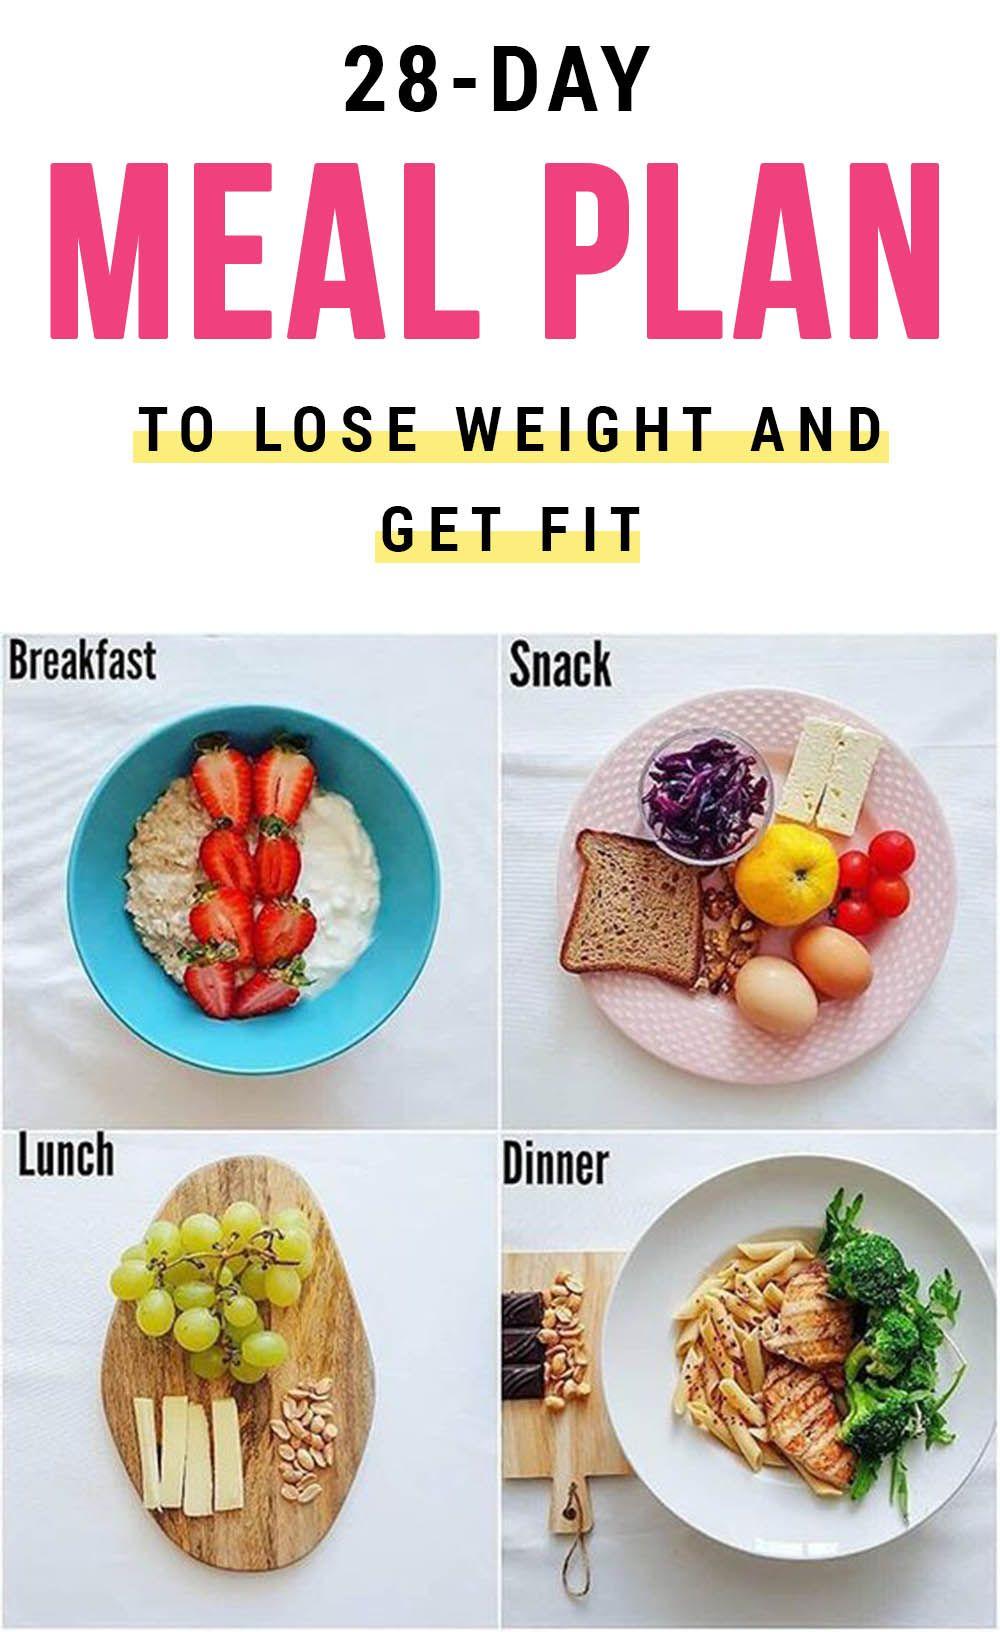 28-Day FAT BURNING Meal Plan